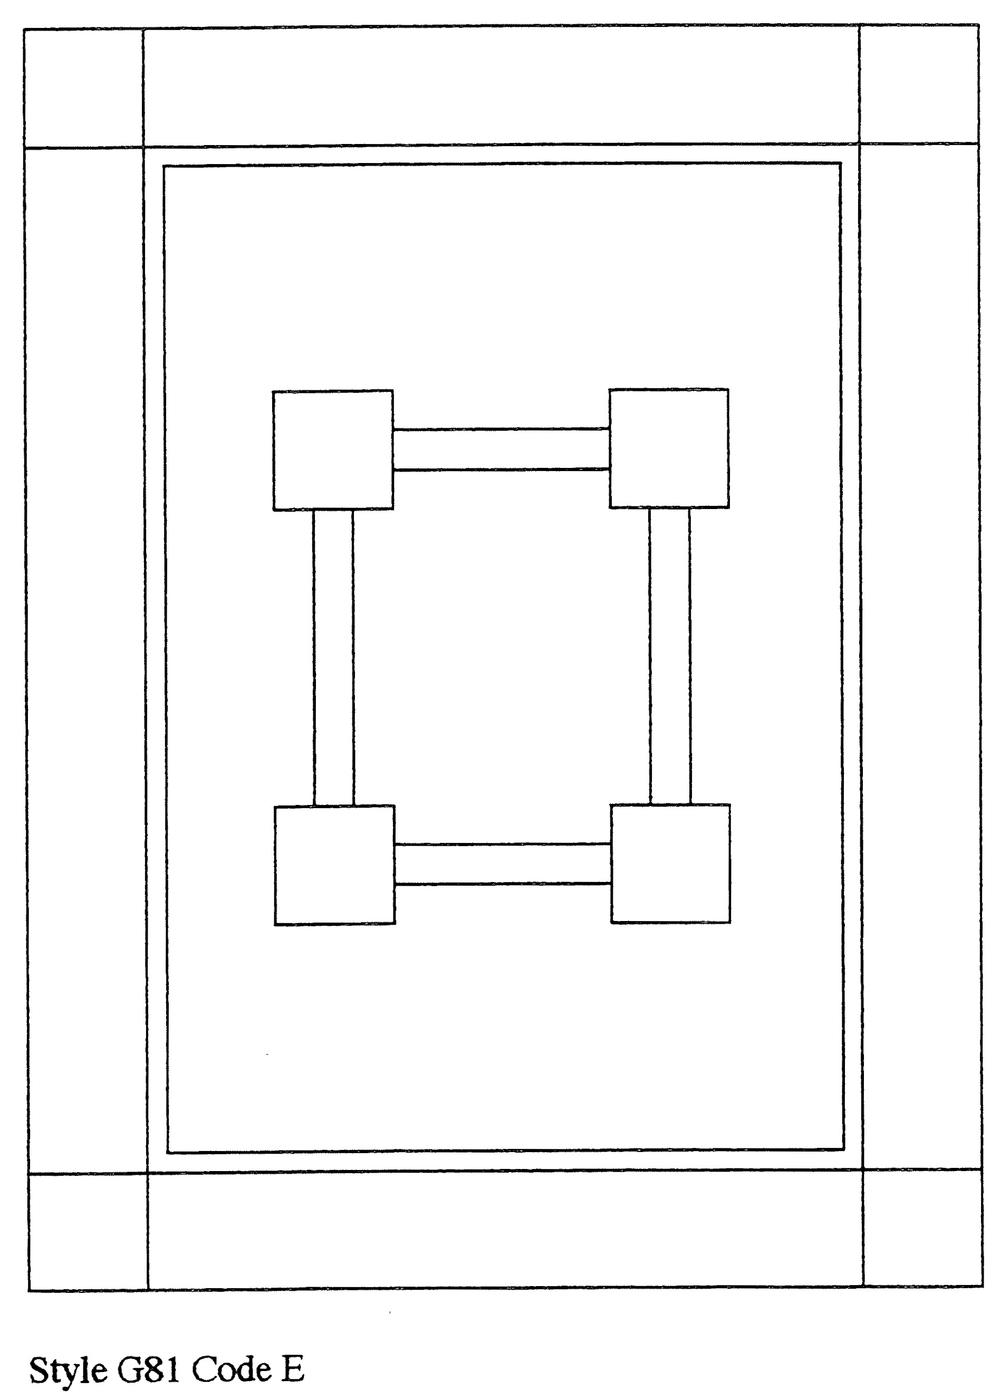 Page 6 copy.jpg